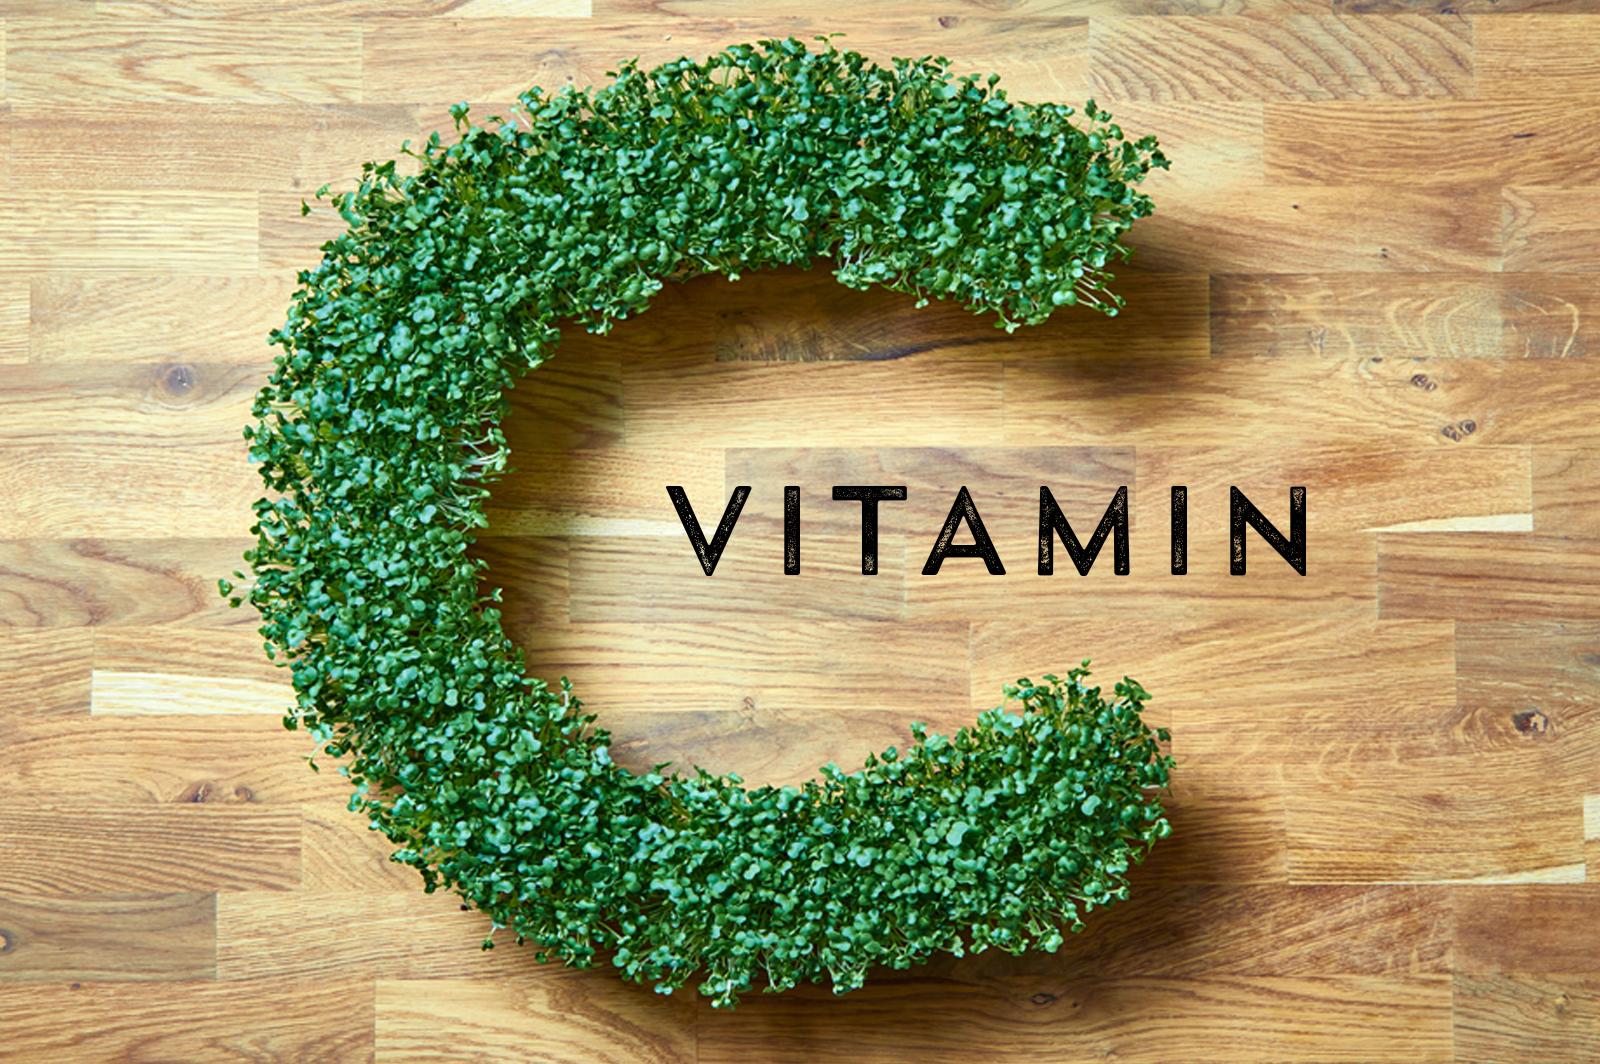 Vitamin C in salad cress